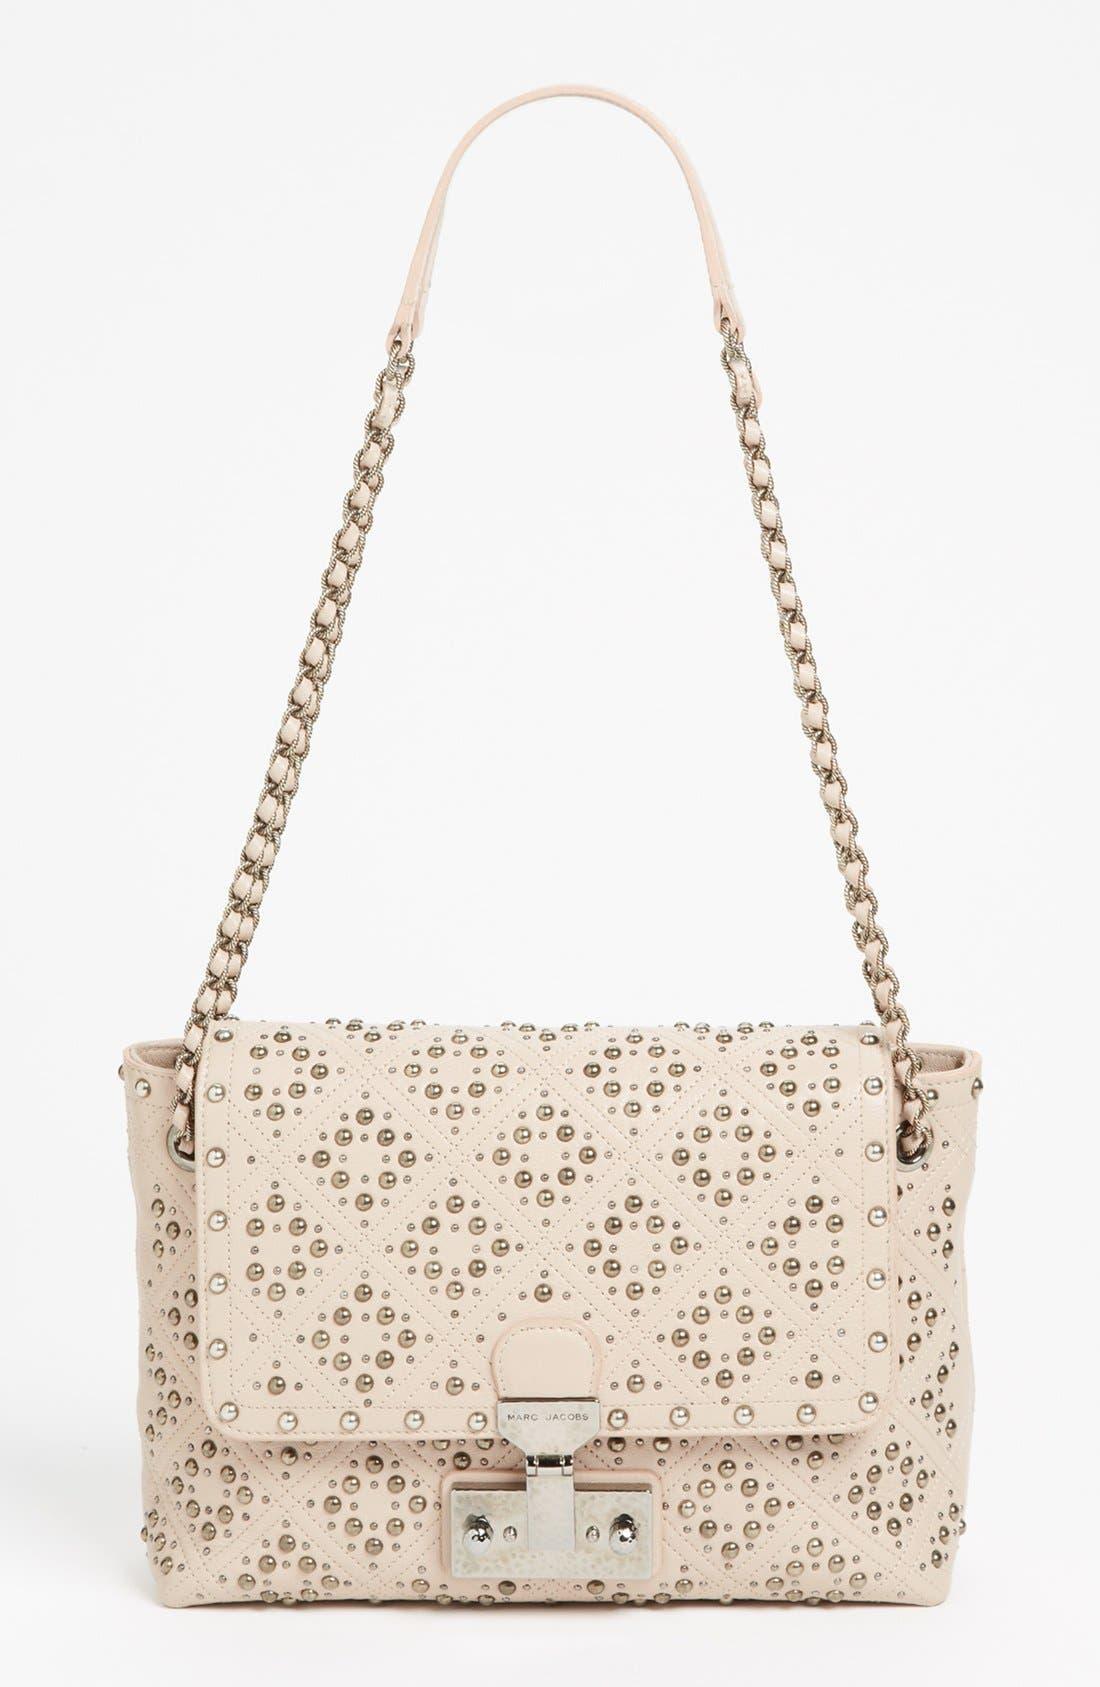 Main Image - MARC JACOBS 'Baroque Studs Single - Large' Leather Crossbody Bag